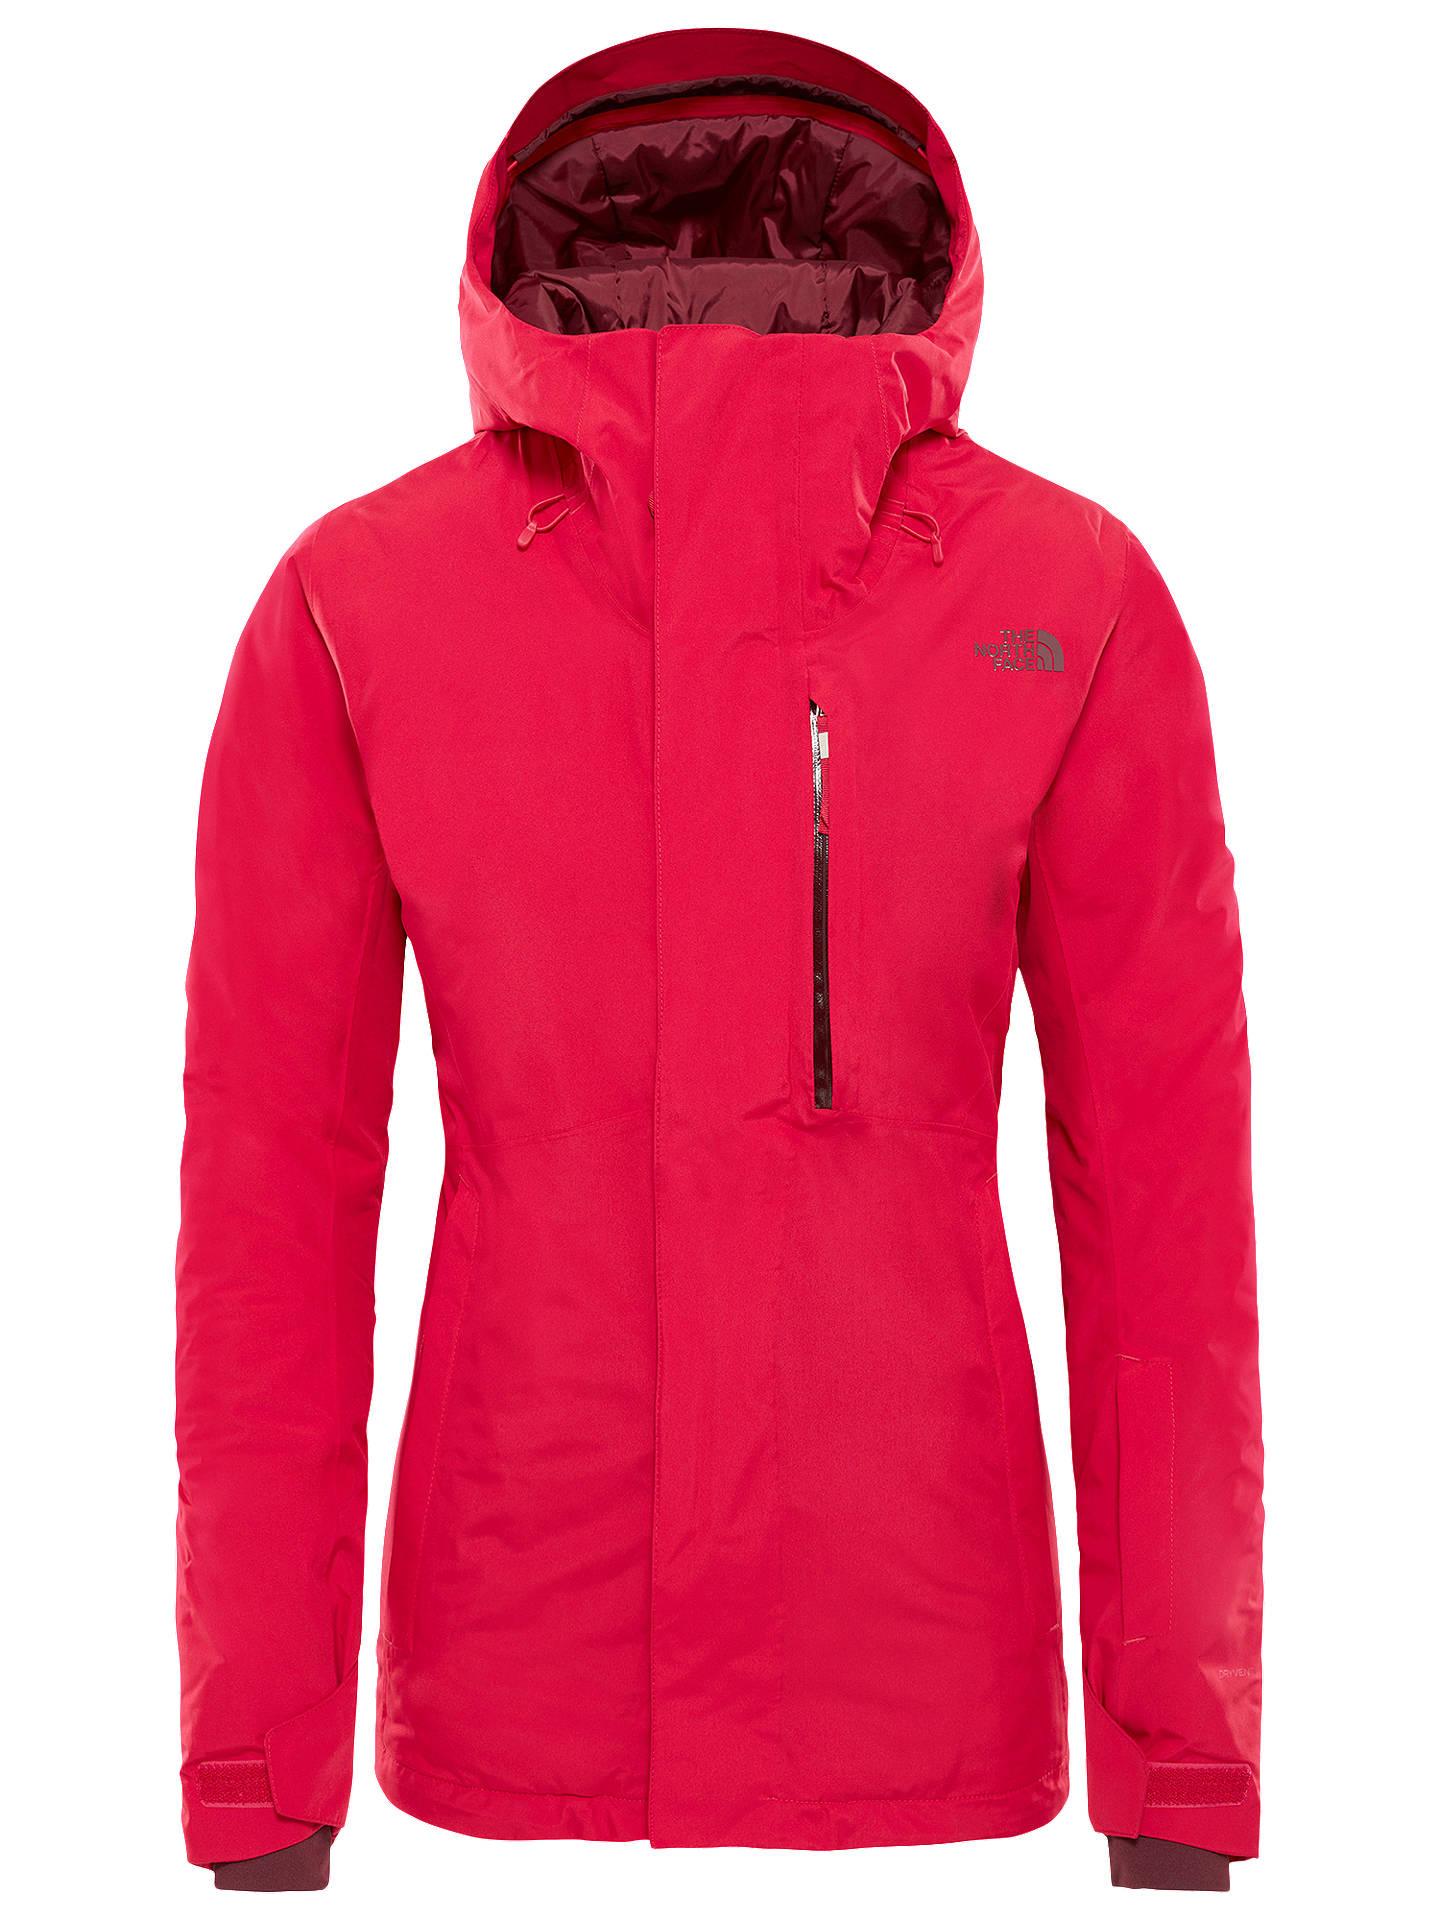 78a7469dc The North Face Descendit Women's Waterproof Ski Jacket, Cerise Pink ...